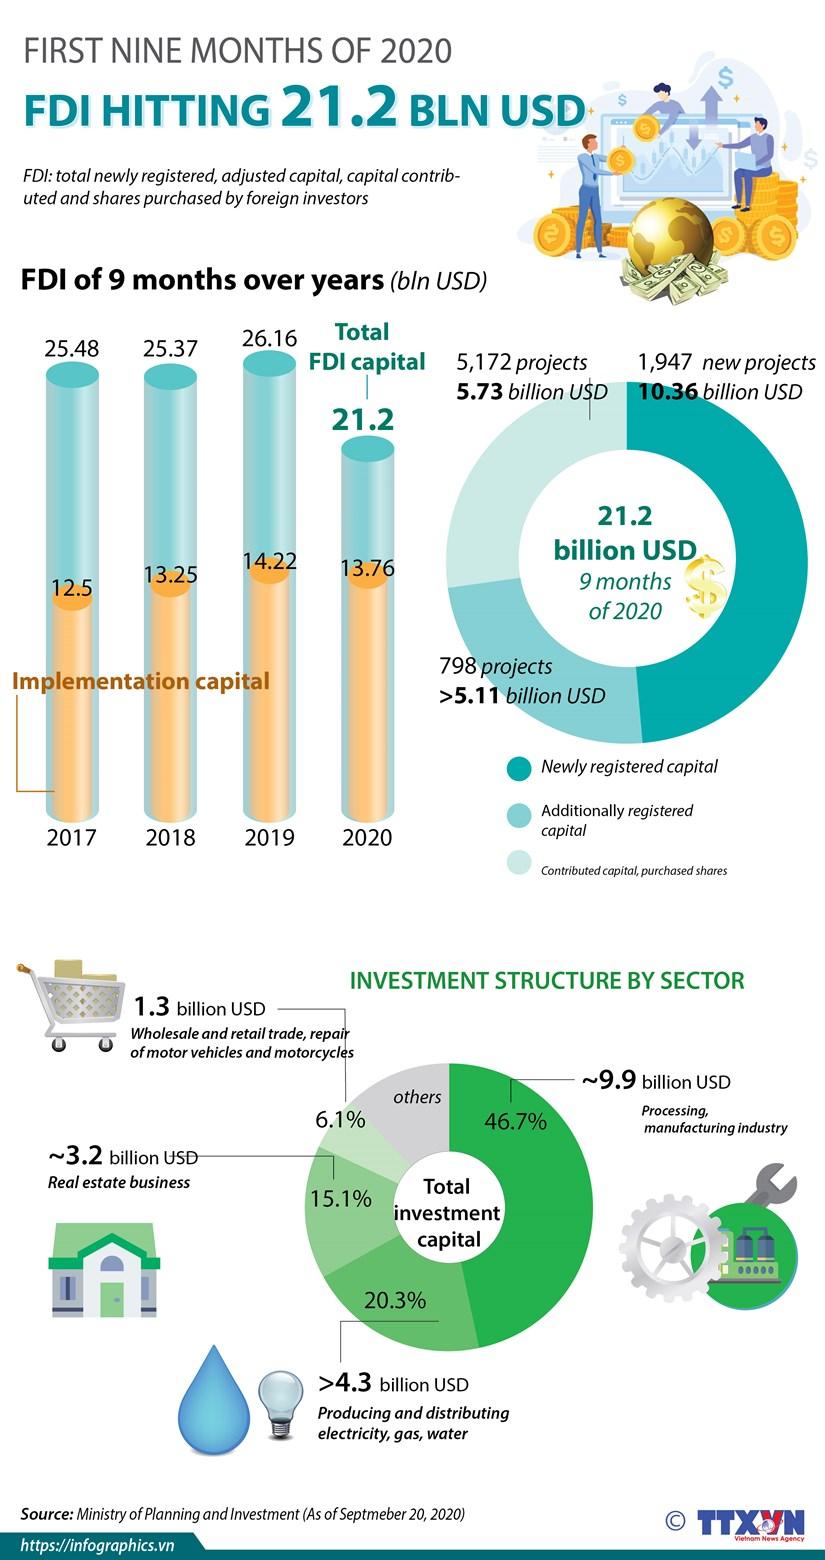 FDI reaching 21.2 billion USD in first nine months hinh anh 1